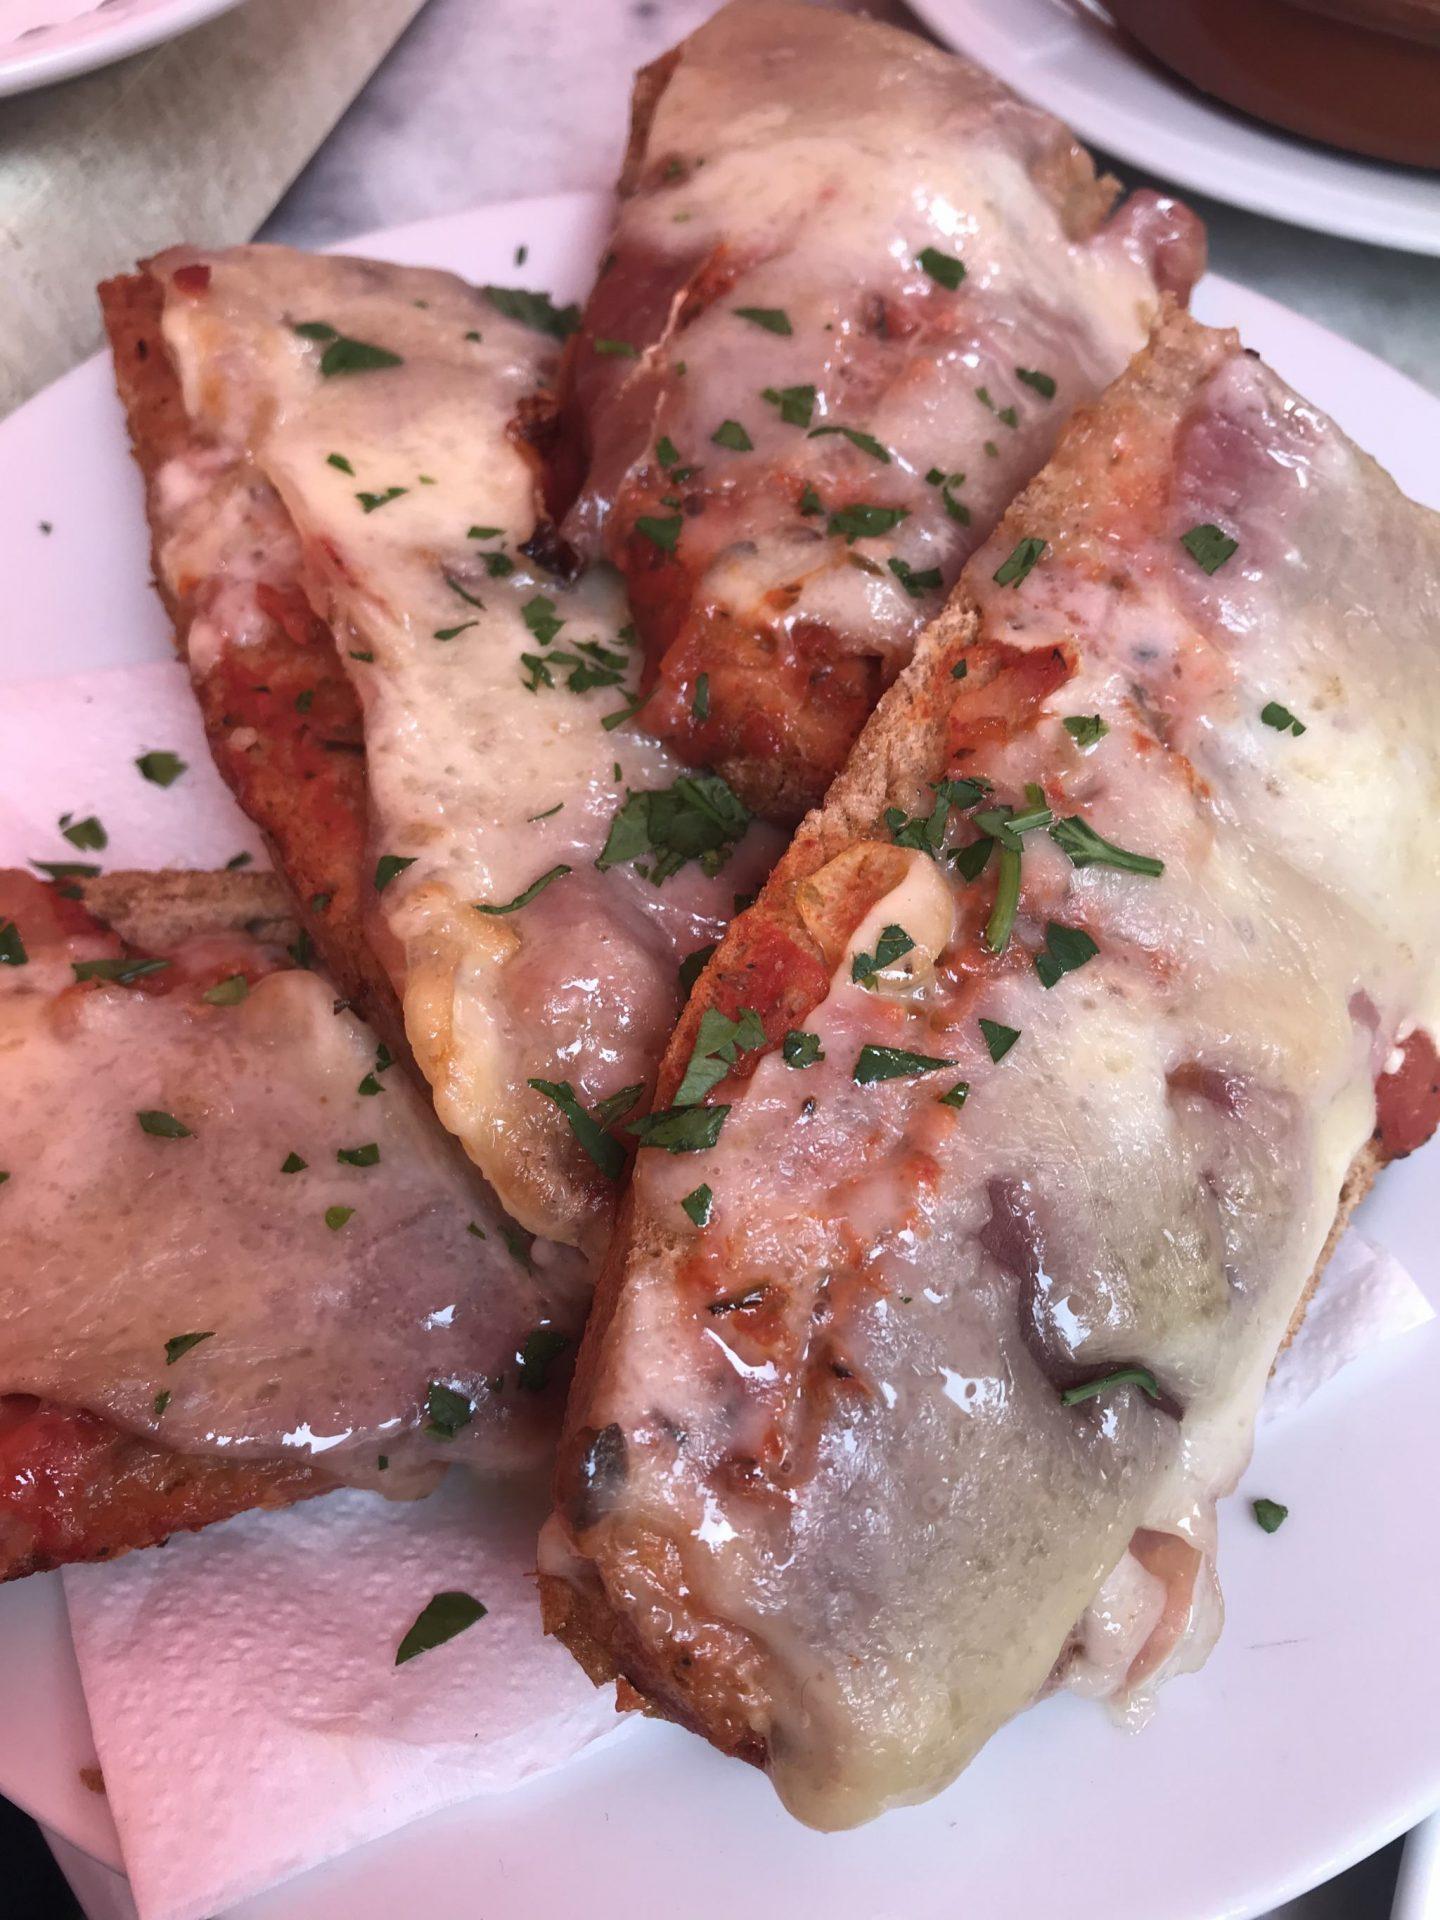 Erfahrung Kritik Bewertung Tapas pa amb oli Bar Coto Palma de Mallorca Foodblog Sternestulle